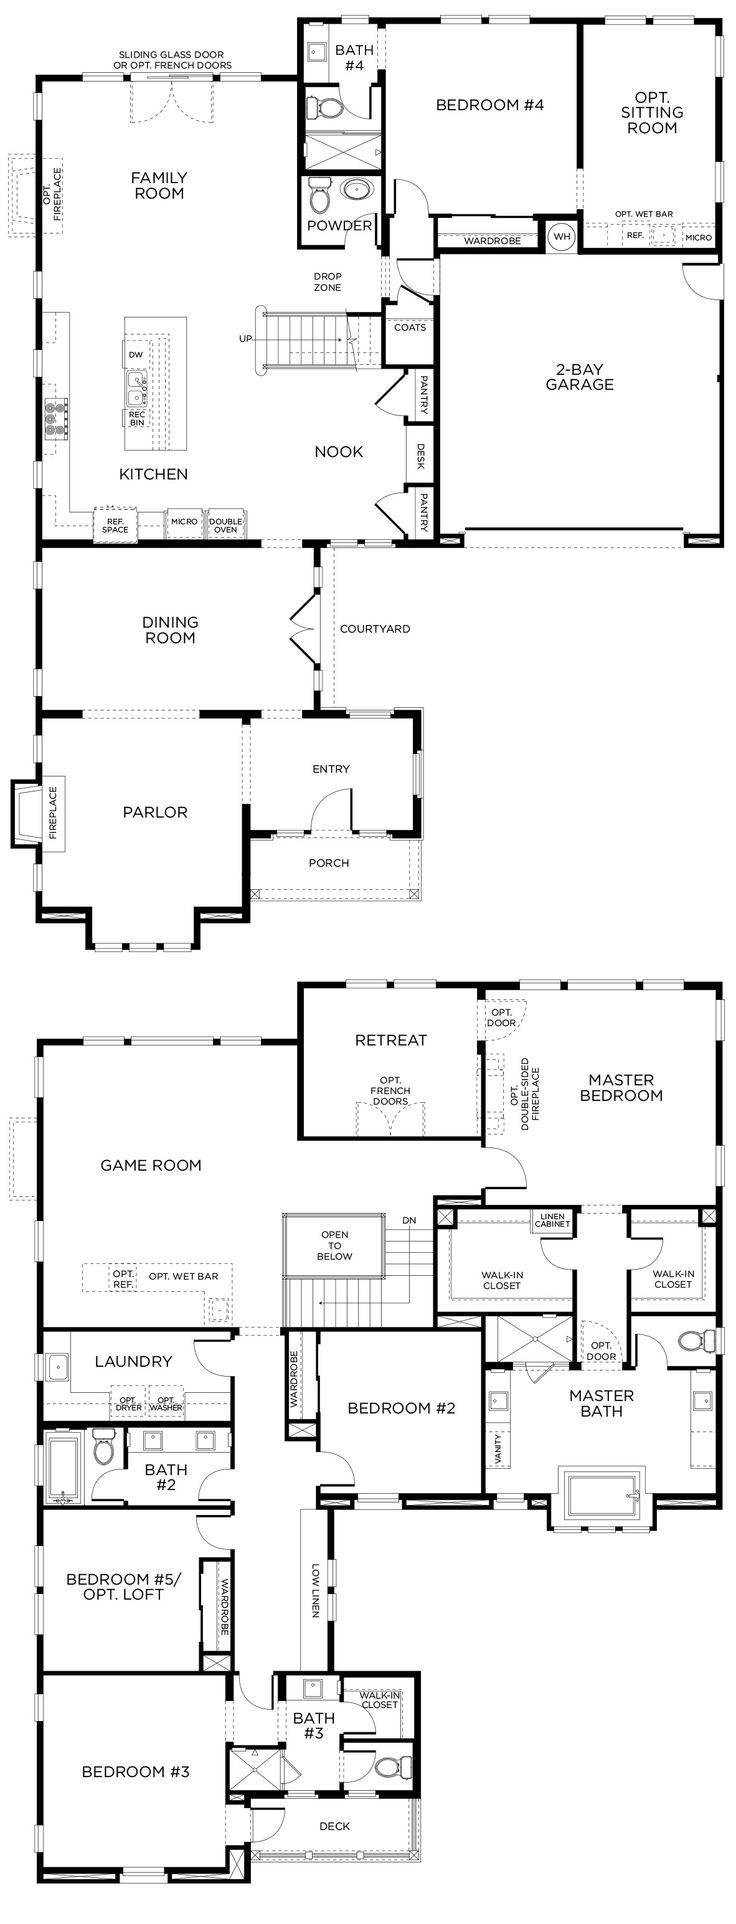 Best Home Design Blueprints Images On Pinterest - Luxury home designs and floor plans